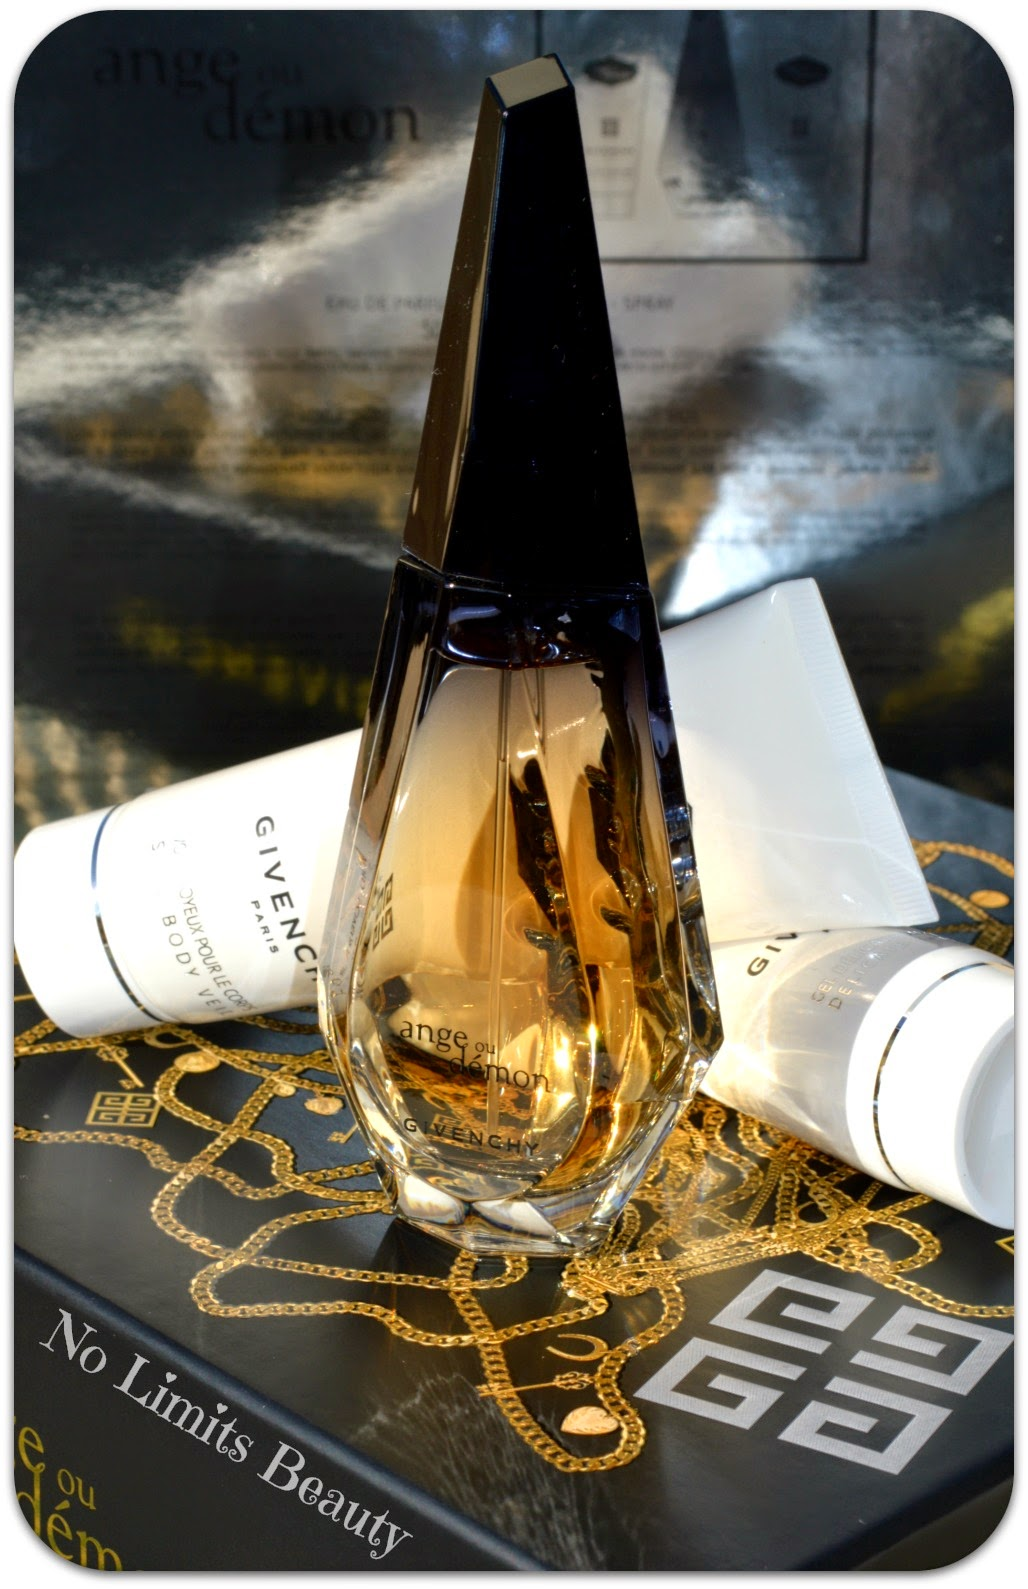 Ange ou Demon de Givenchy: perfume